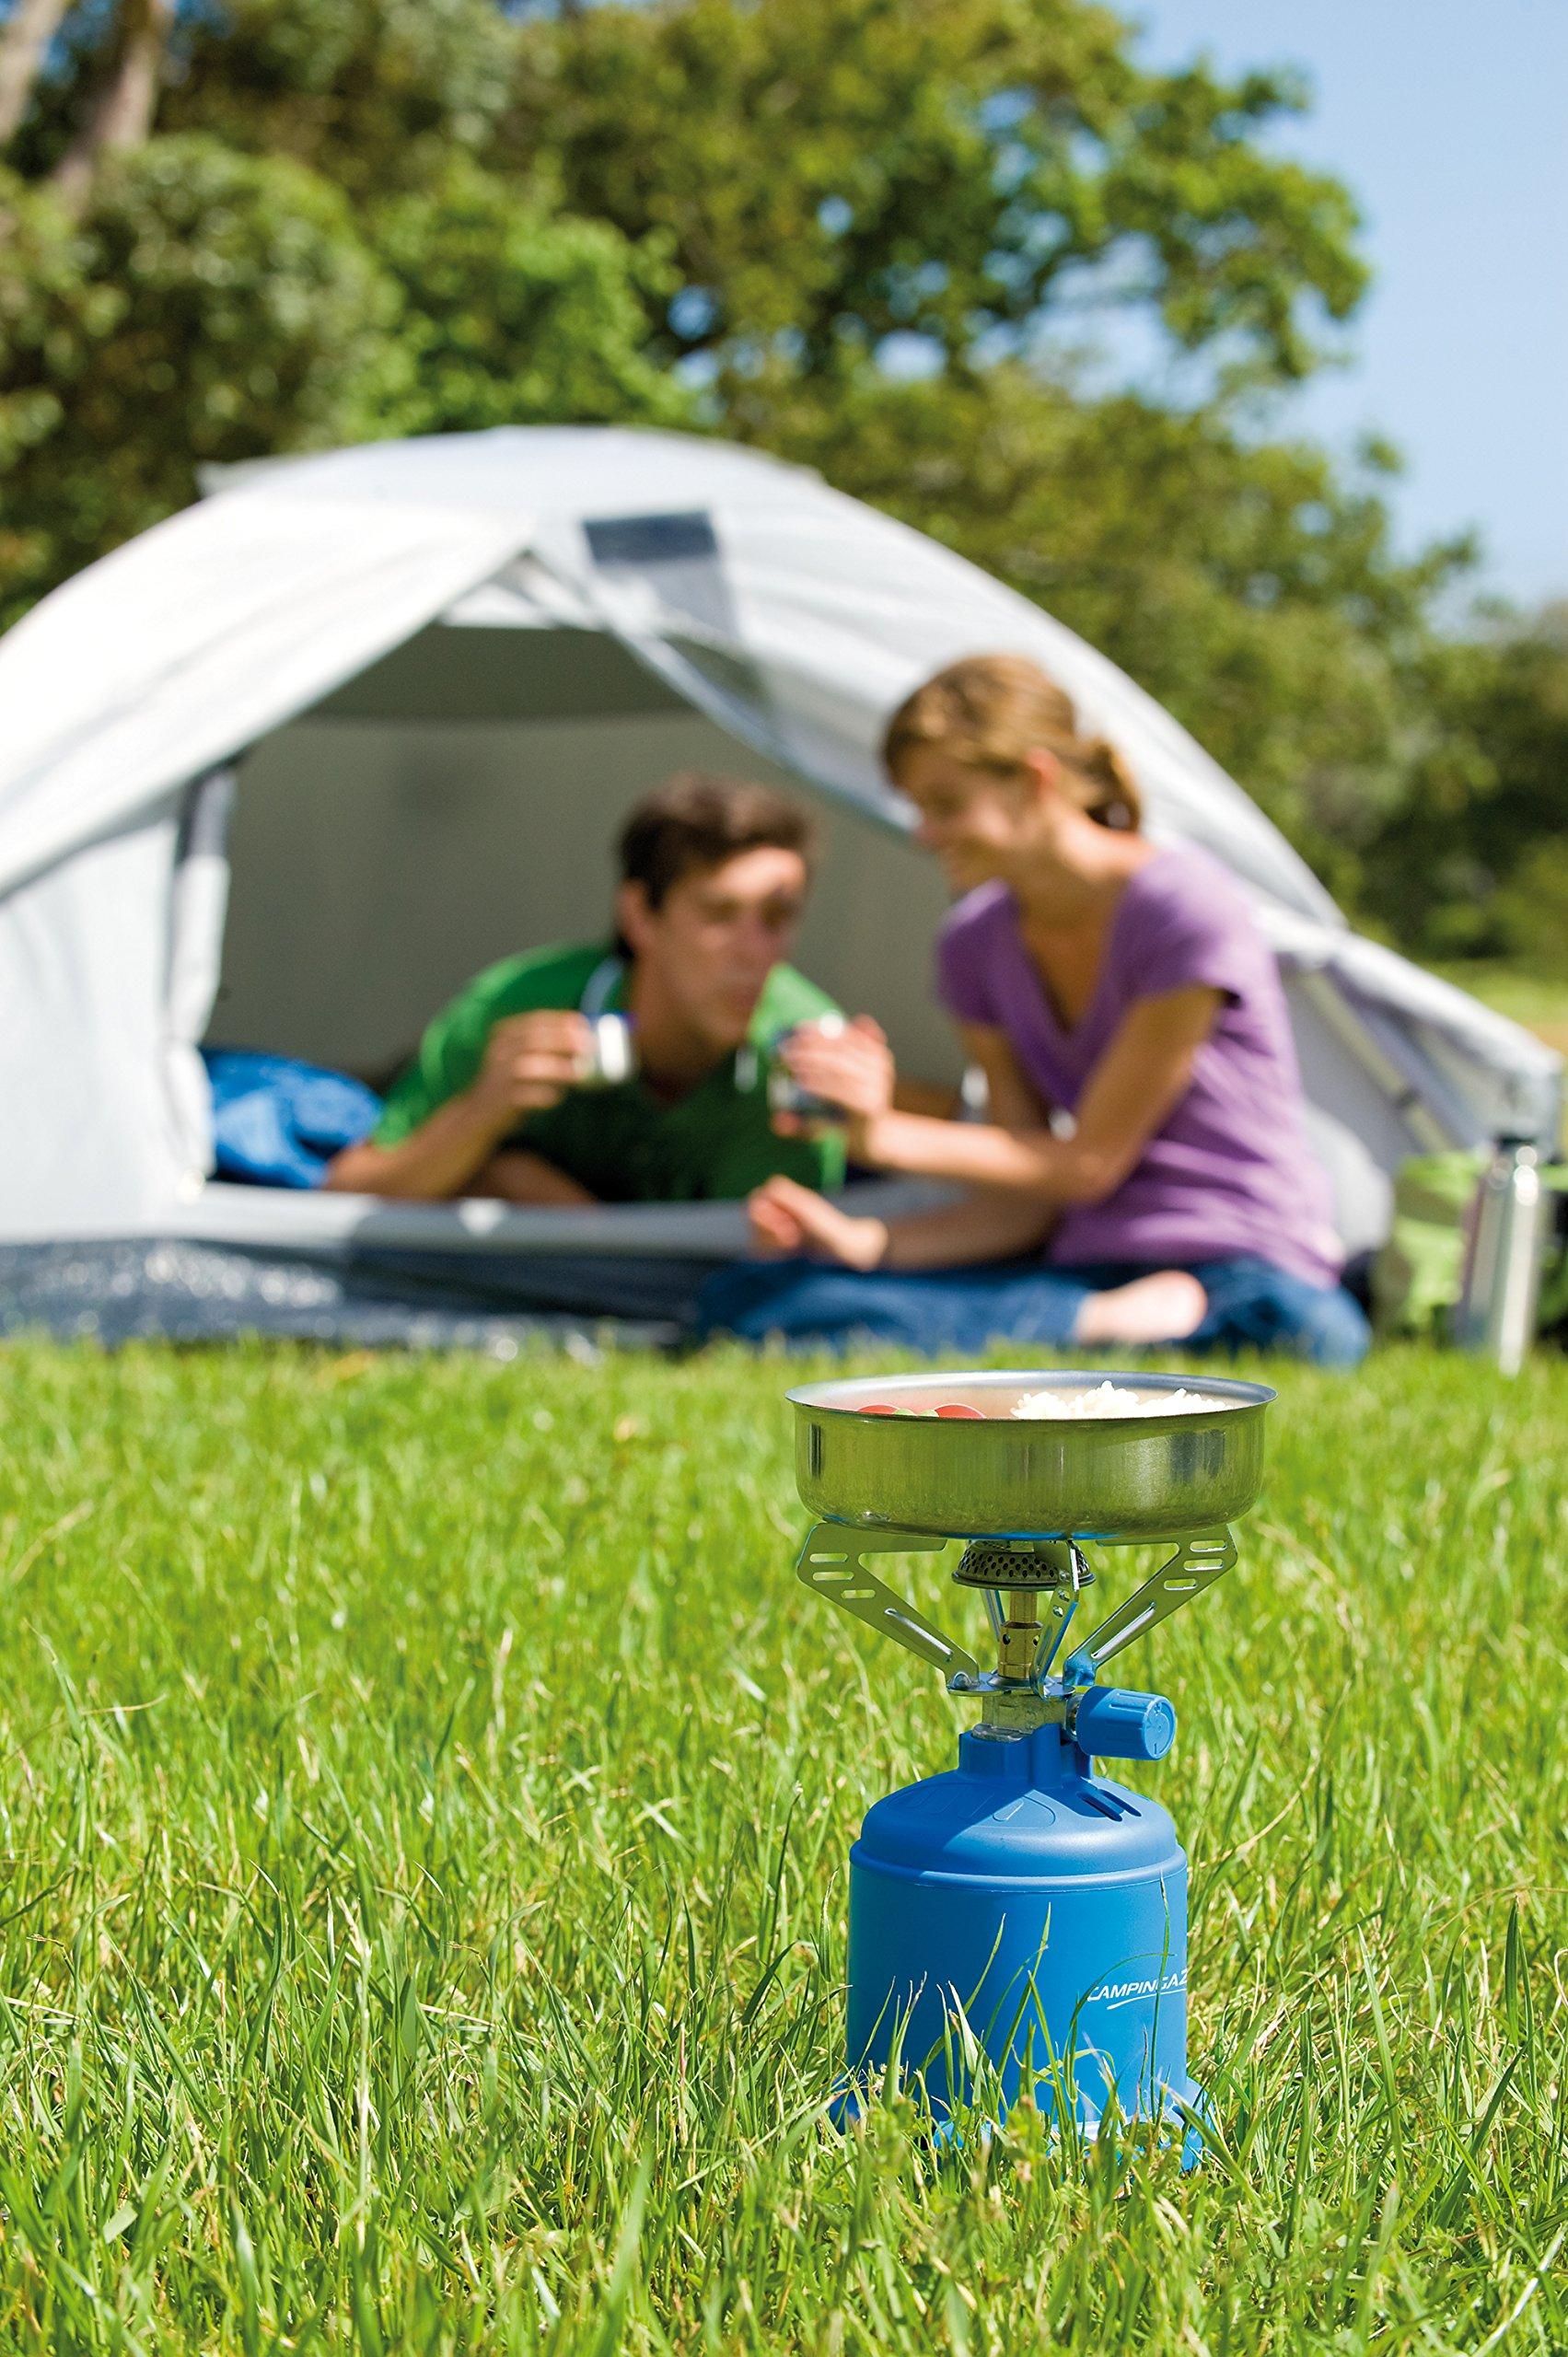 91io07Q4LzL - Campingaz Camping 206 Stove